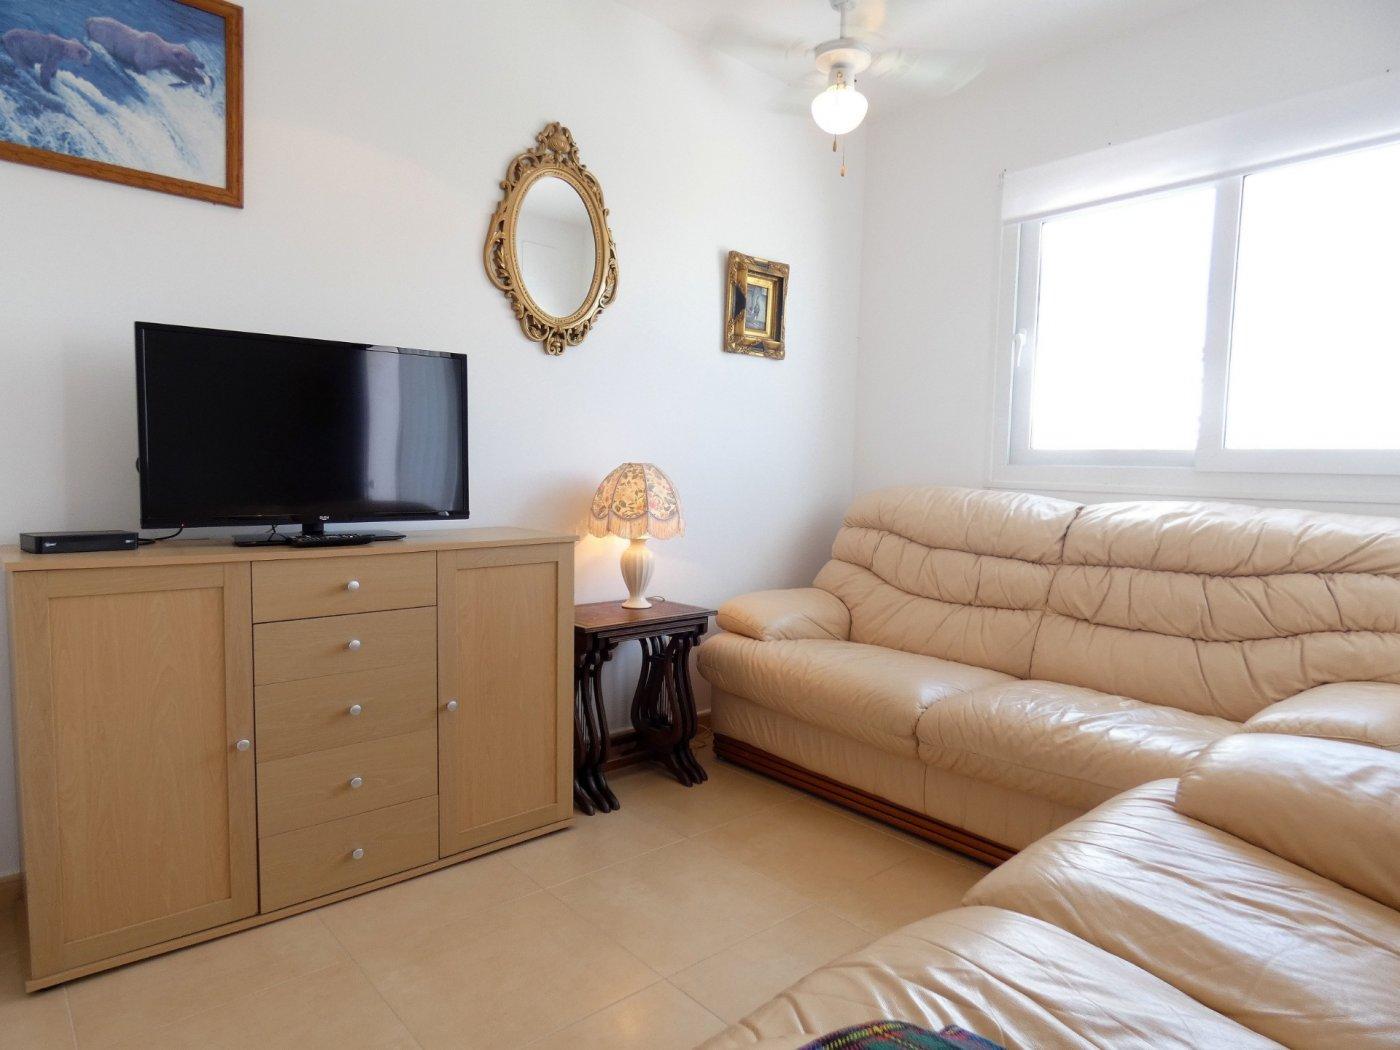 Gallery Image 19 of Key-Ready 2 Bedroom Apartment Overlooking the Citrus Groves in Jardin 10, Condado de Alhama